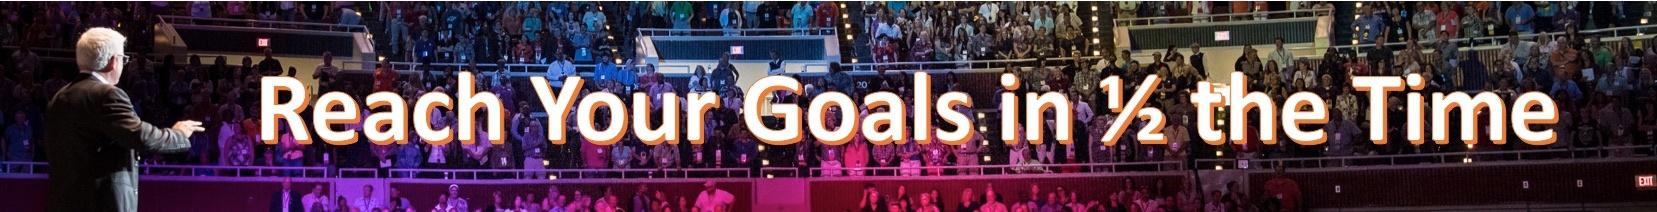 Goals half time SKINNY lo res banner.jpg